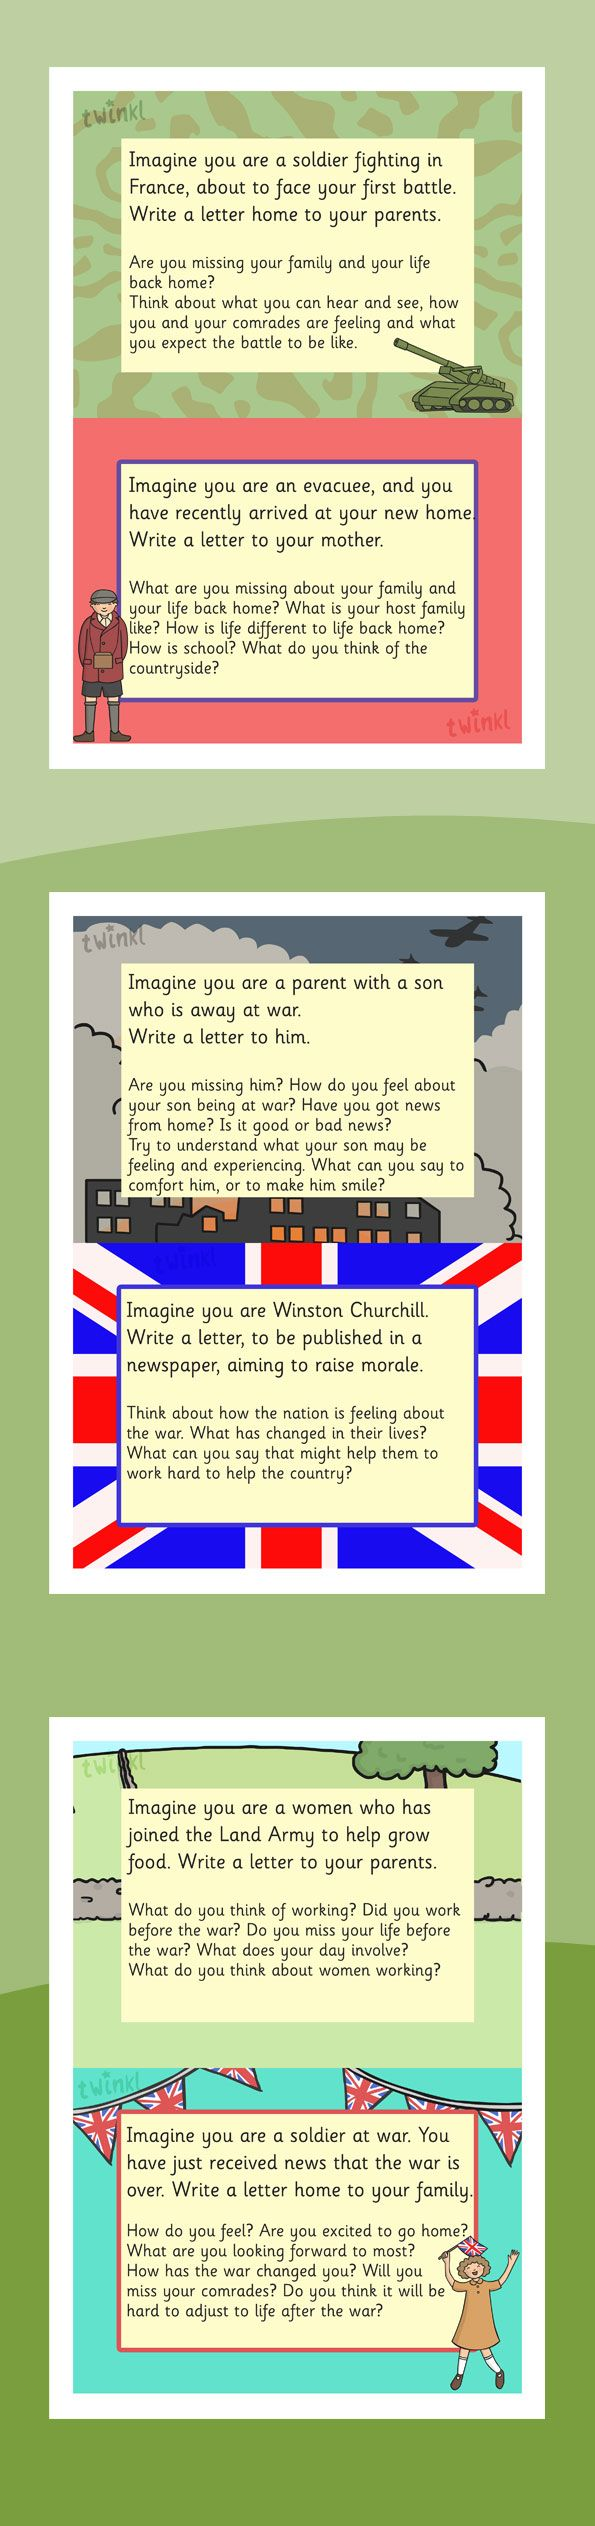 World War 2 Letter Writing Challenge Cards